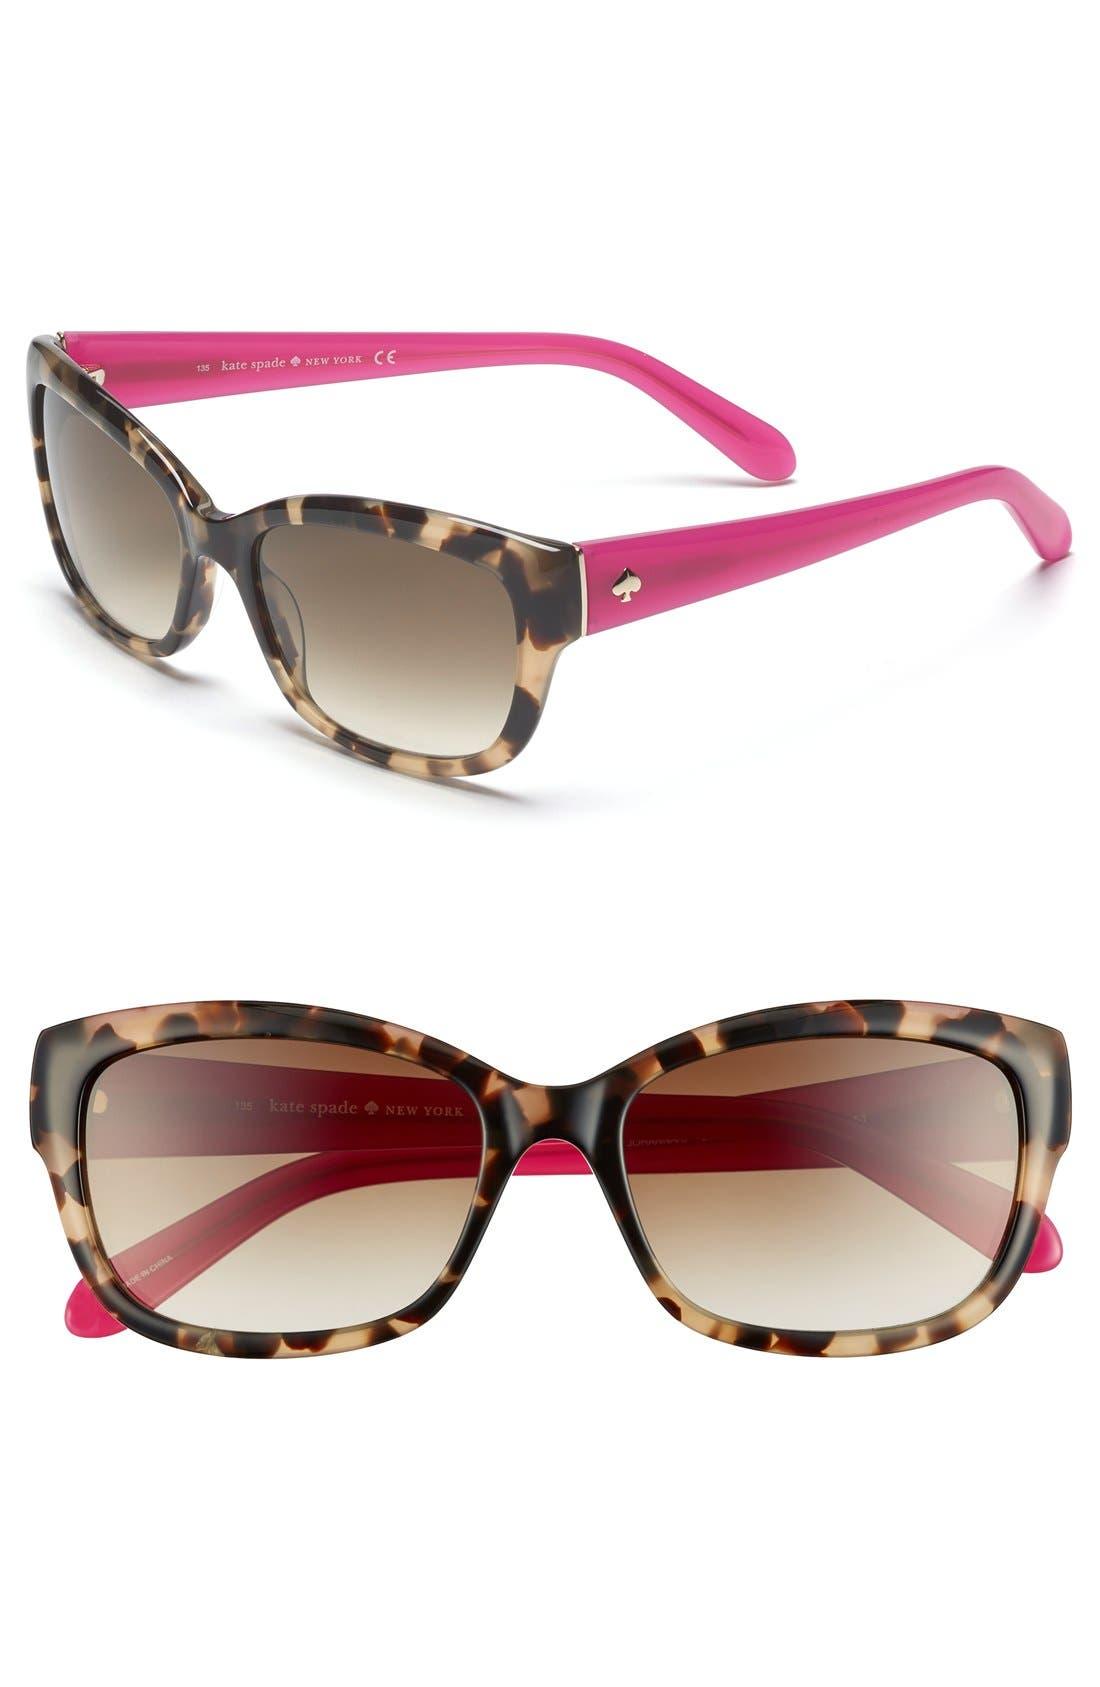 Main Image - kate spade 'johanna' 53mm retro sunglasses